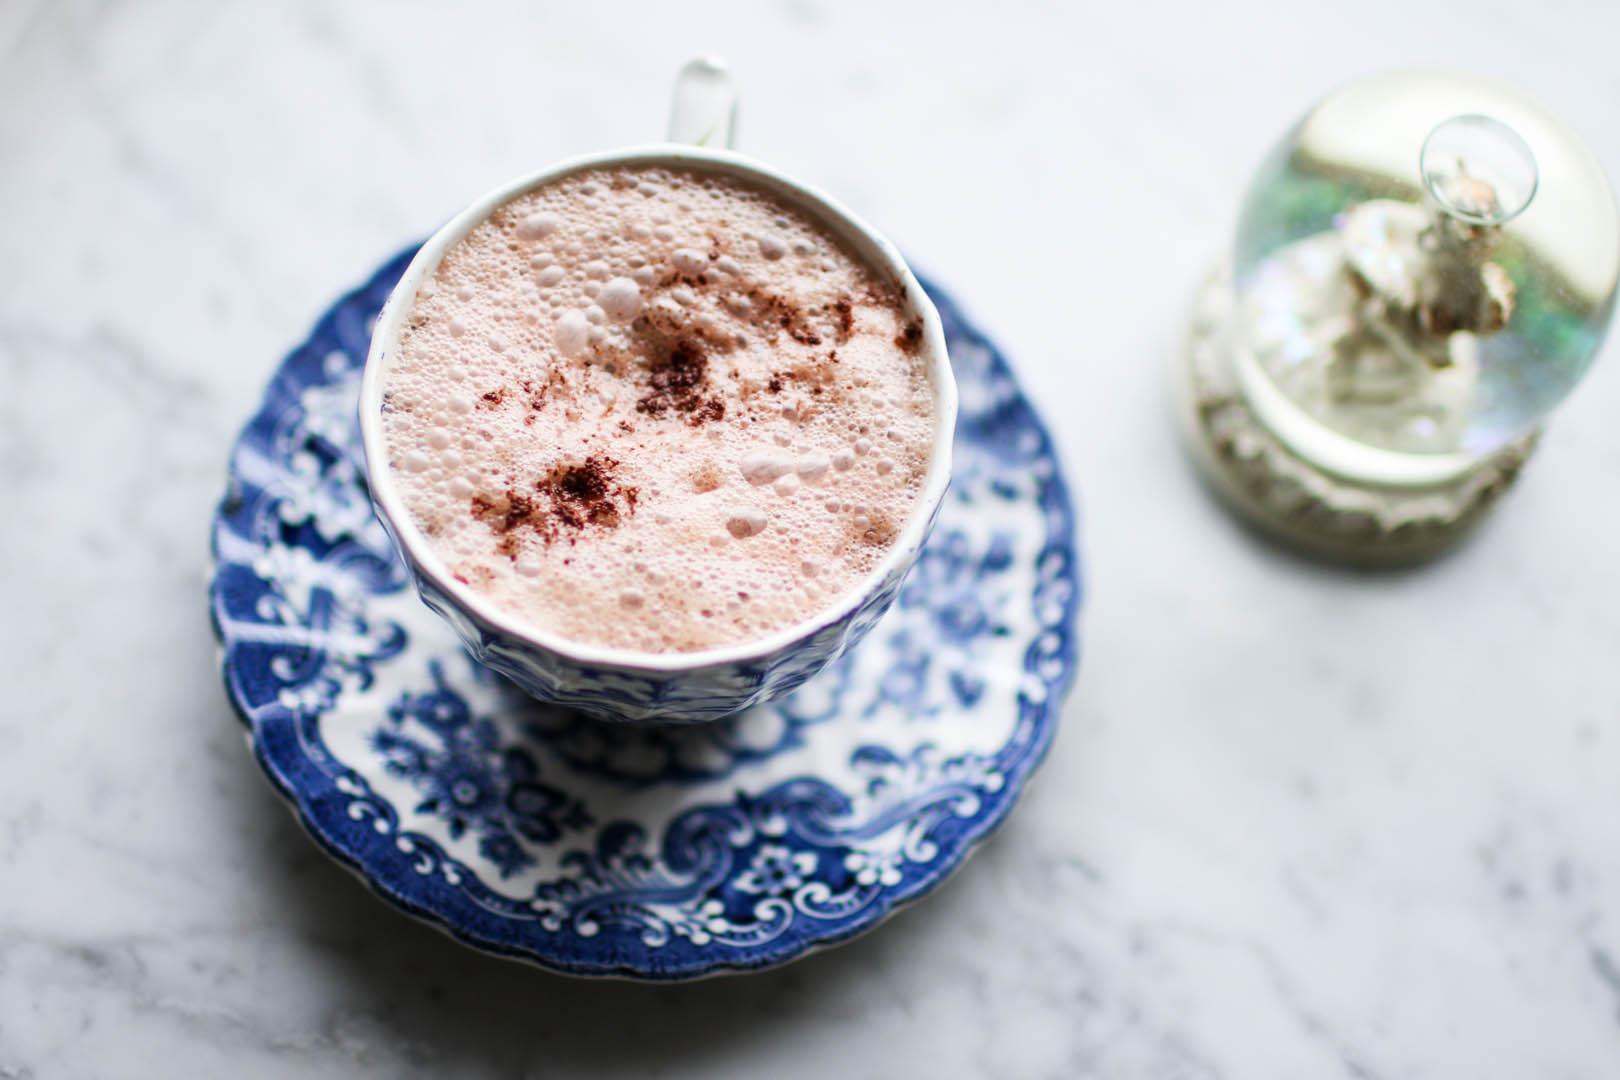 Vegansk varm choklad recept